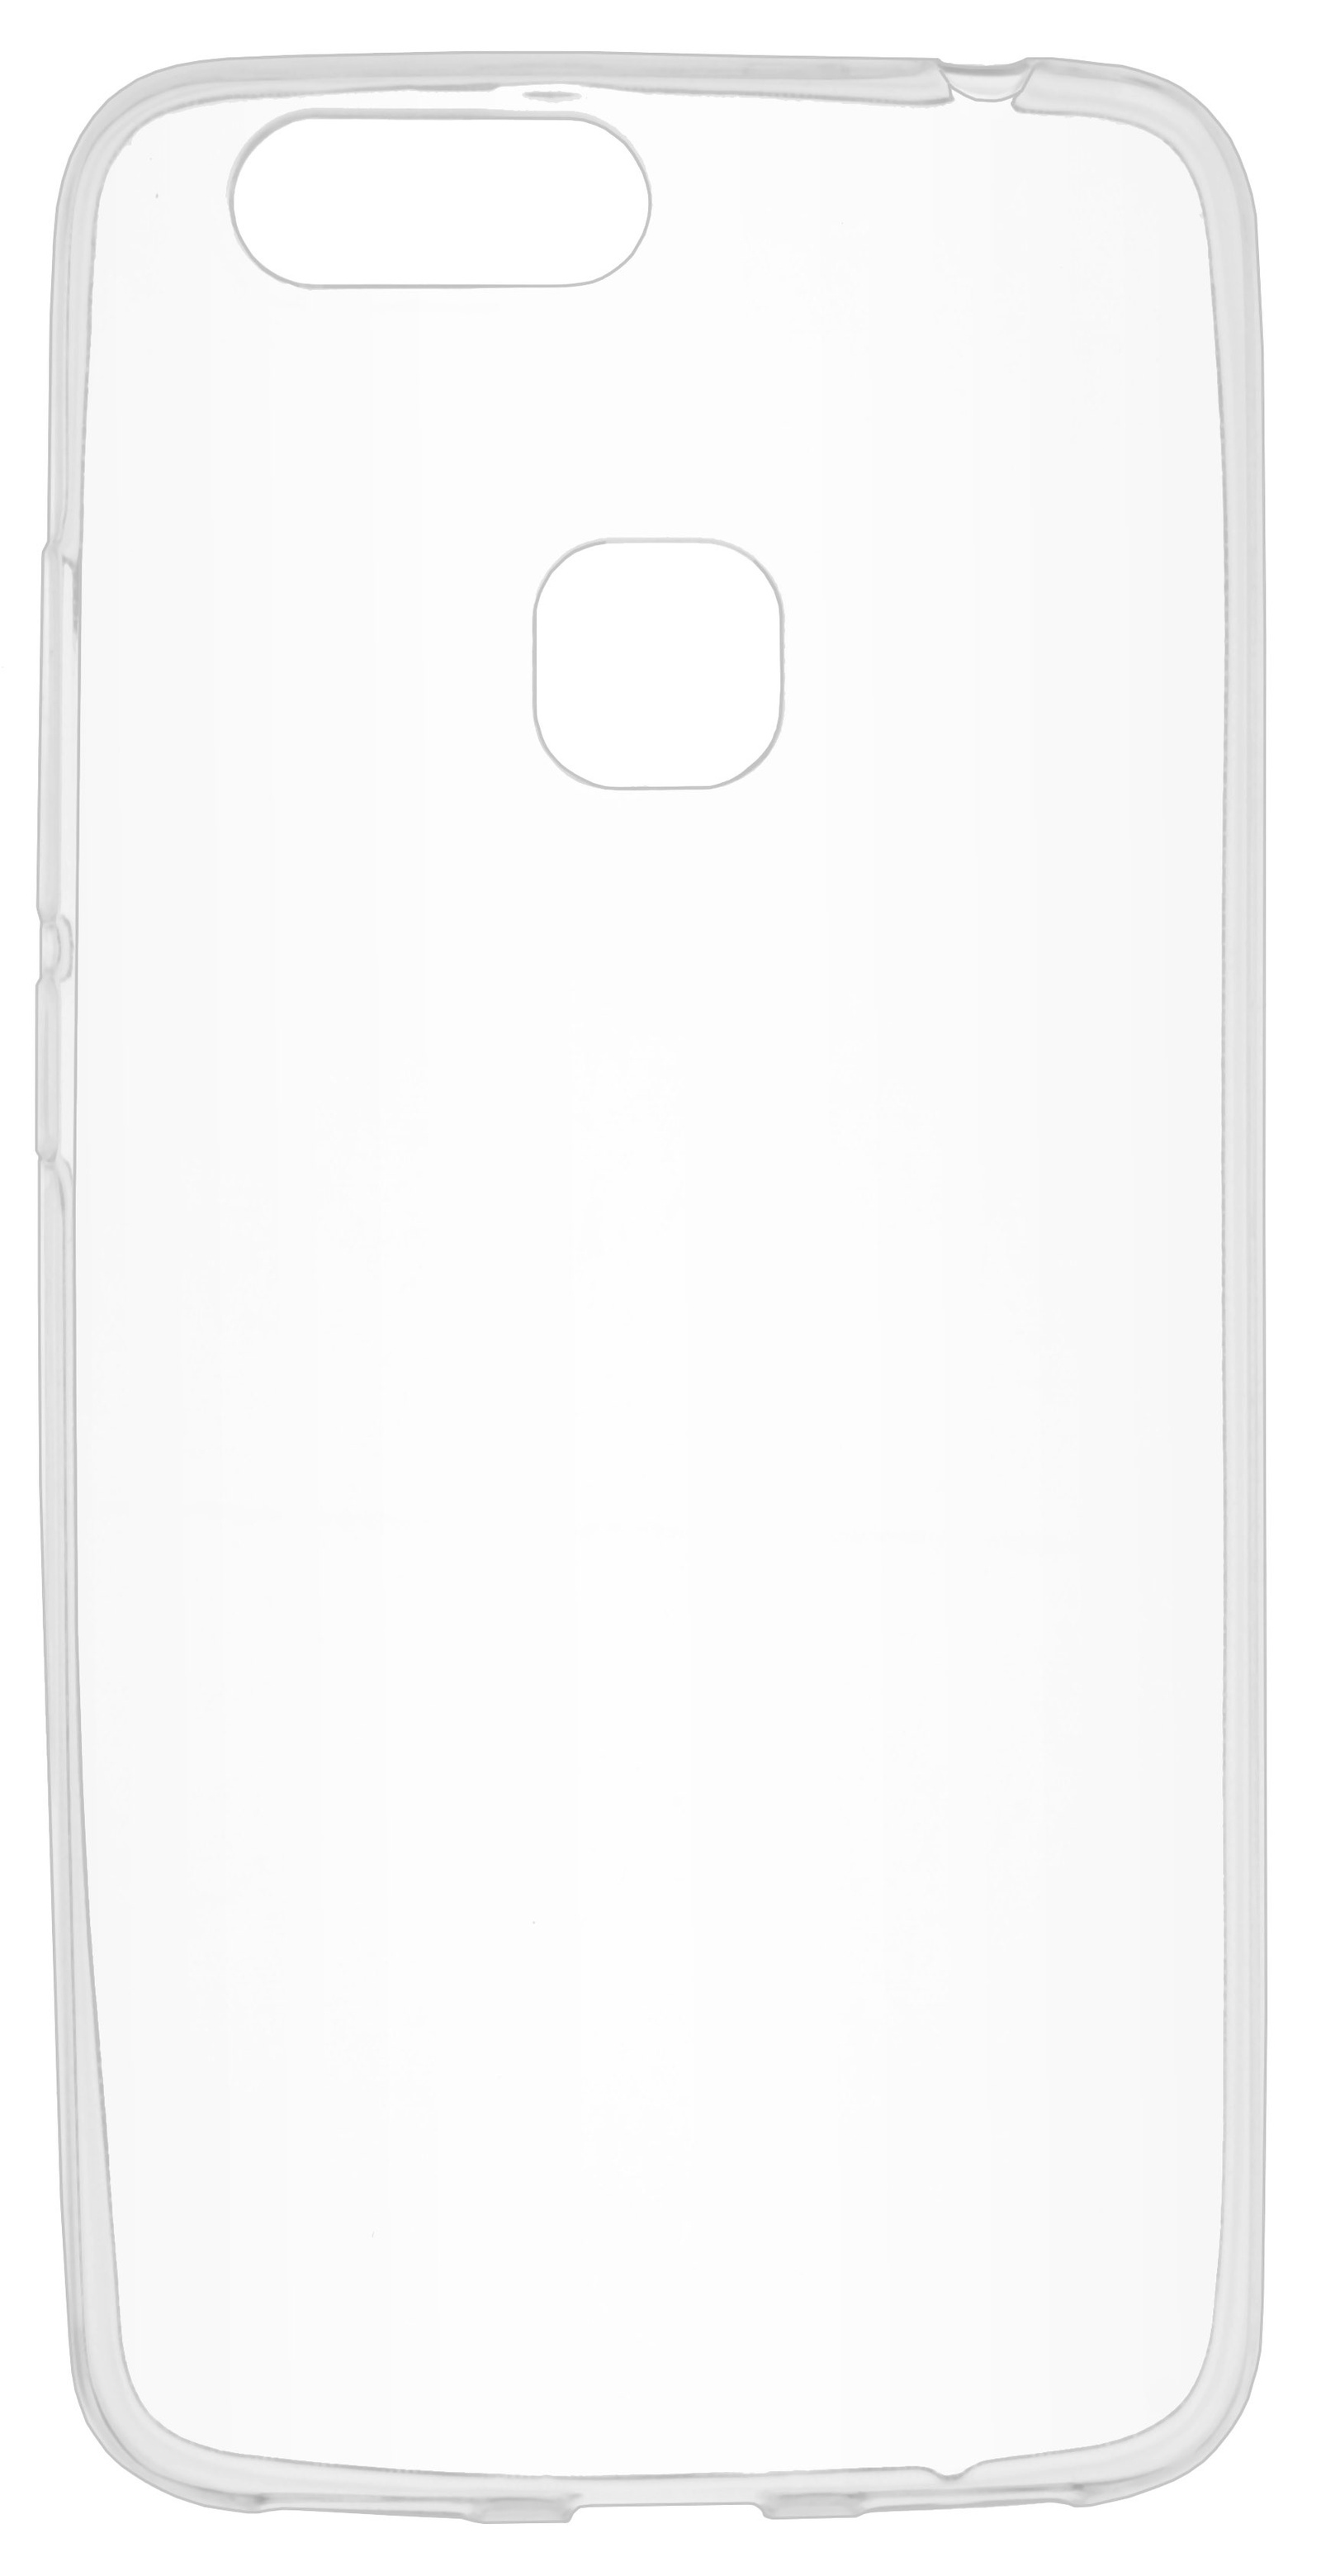 Чехол для сотового телефона skinBOX Slim Silicone, 4630042521612, прозрачный чехол для xiaomi redmi pro skinbox 4people slim silicone case прозрачный